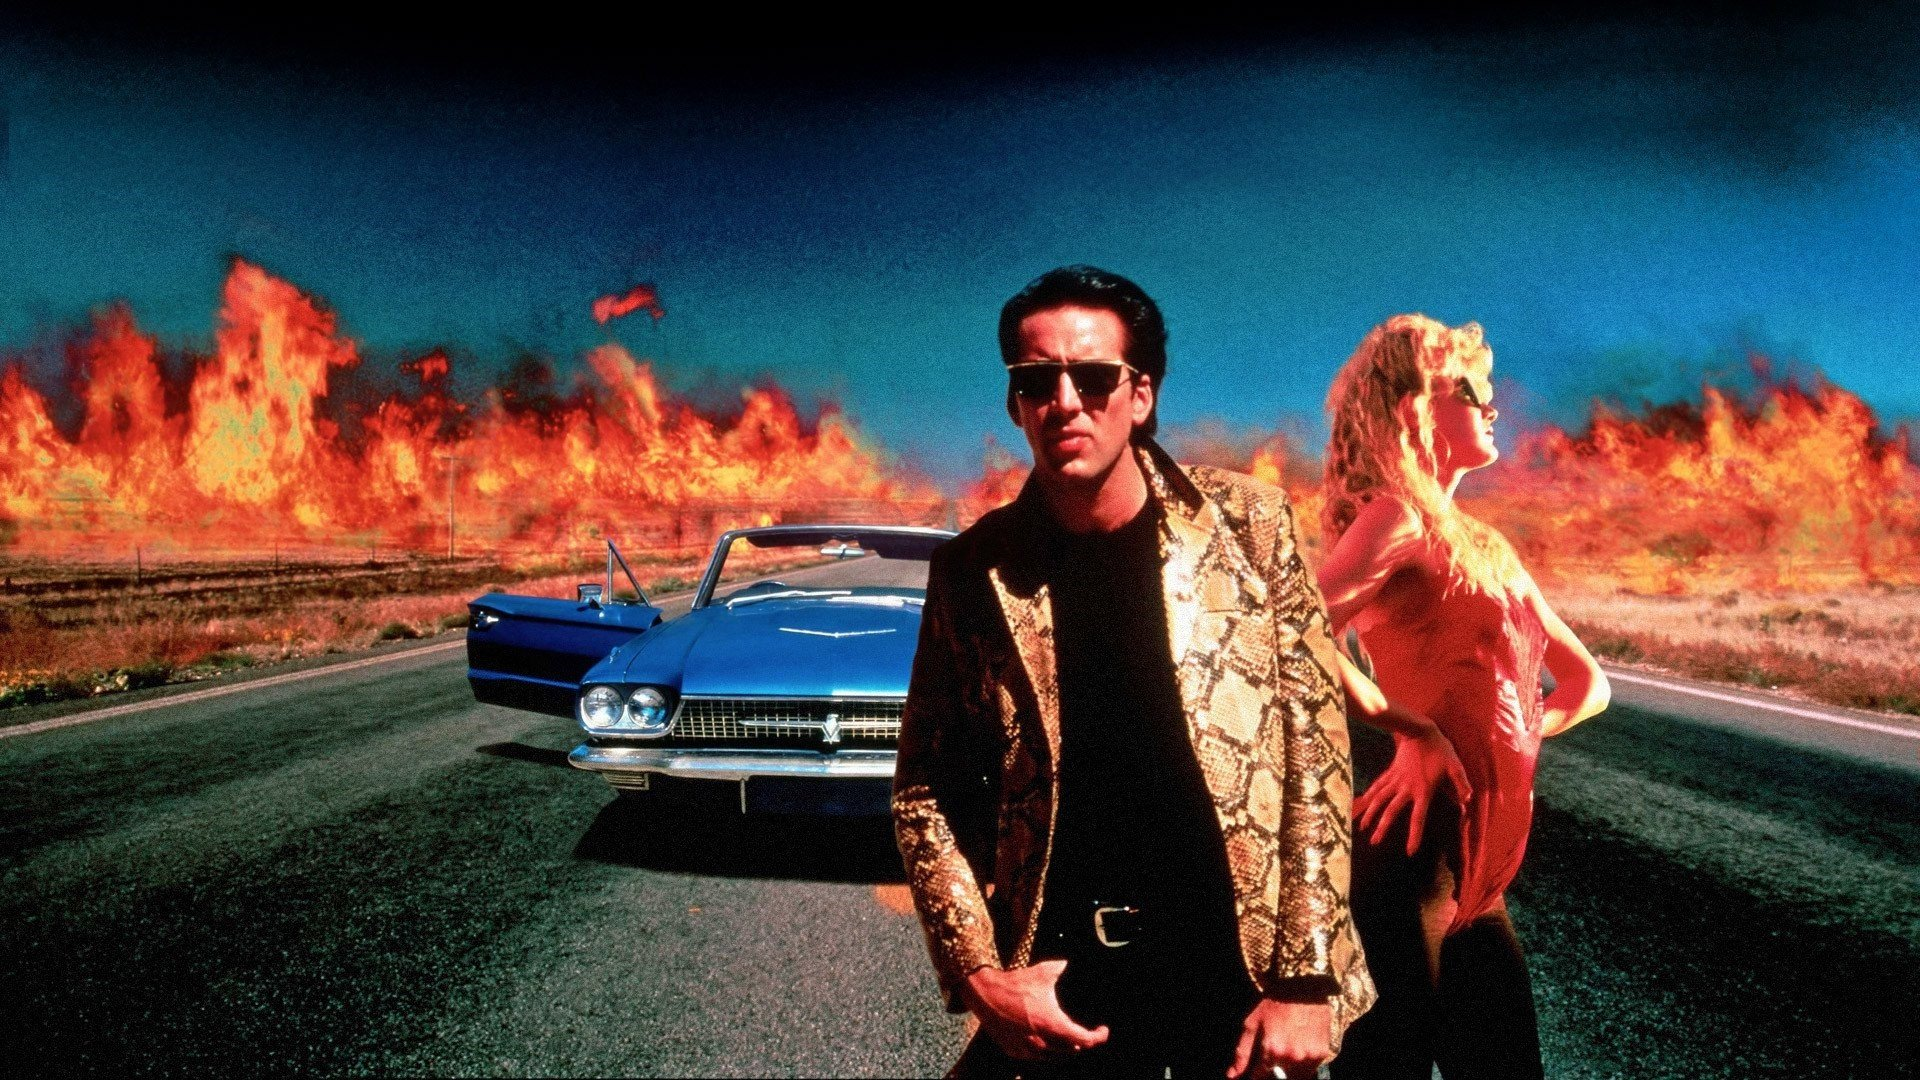 Summer of '90: Wild at Heart